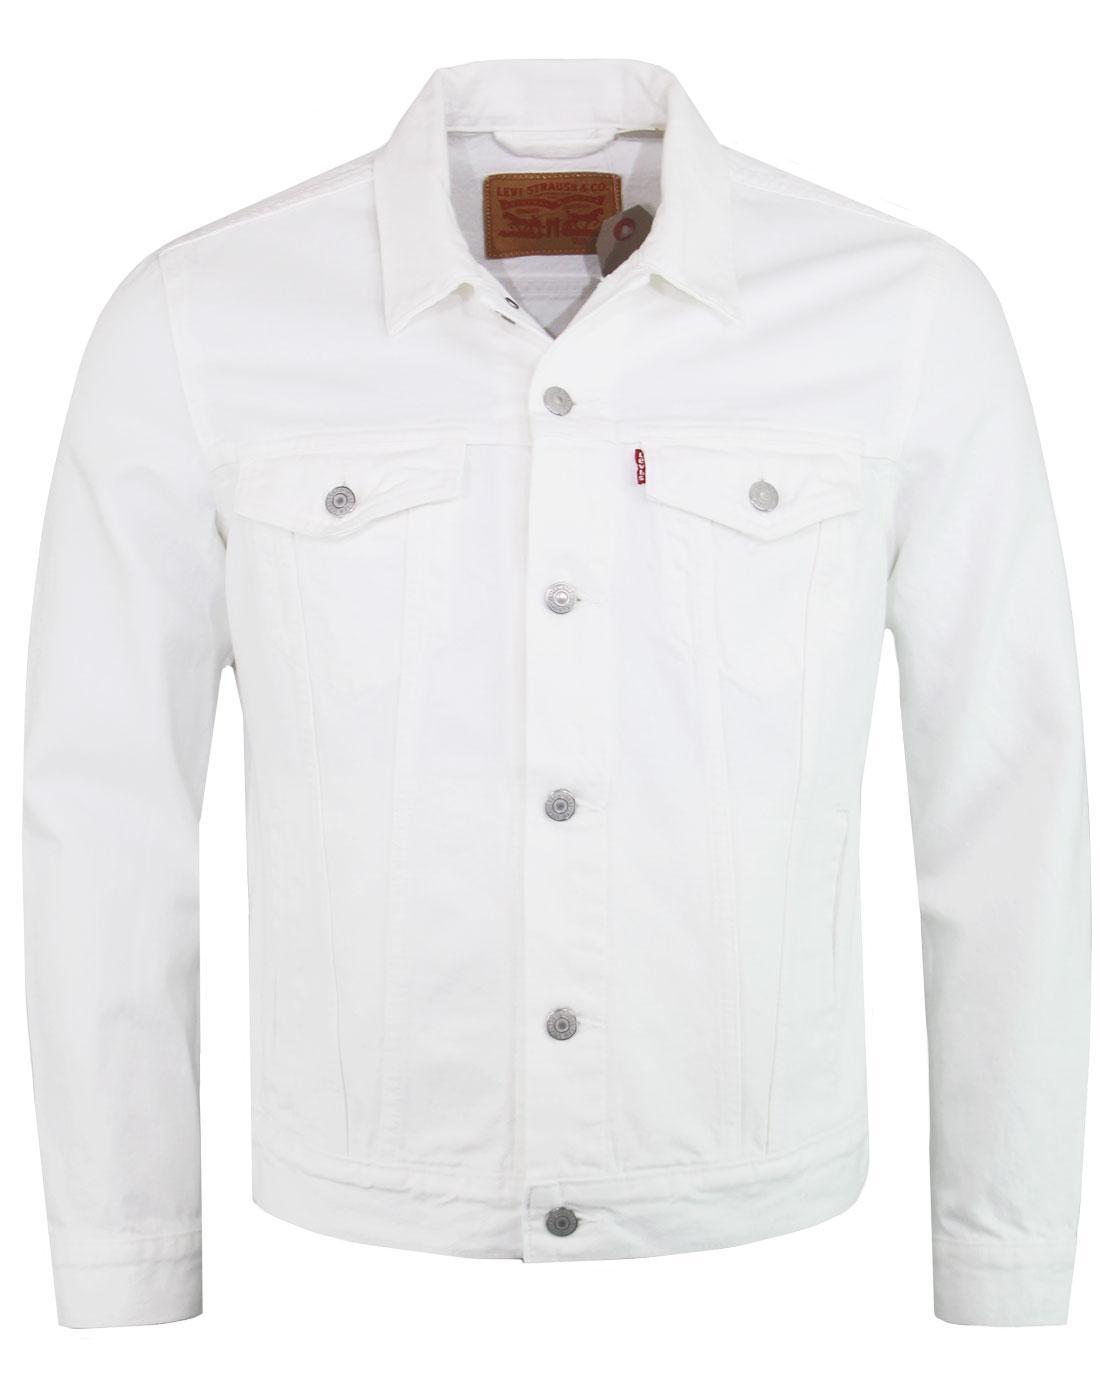 LEVI'S Mod White Denim Trucker Jacket STEEL HOUR